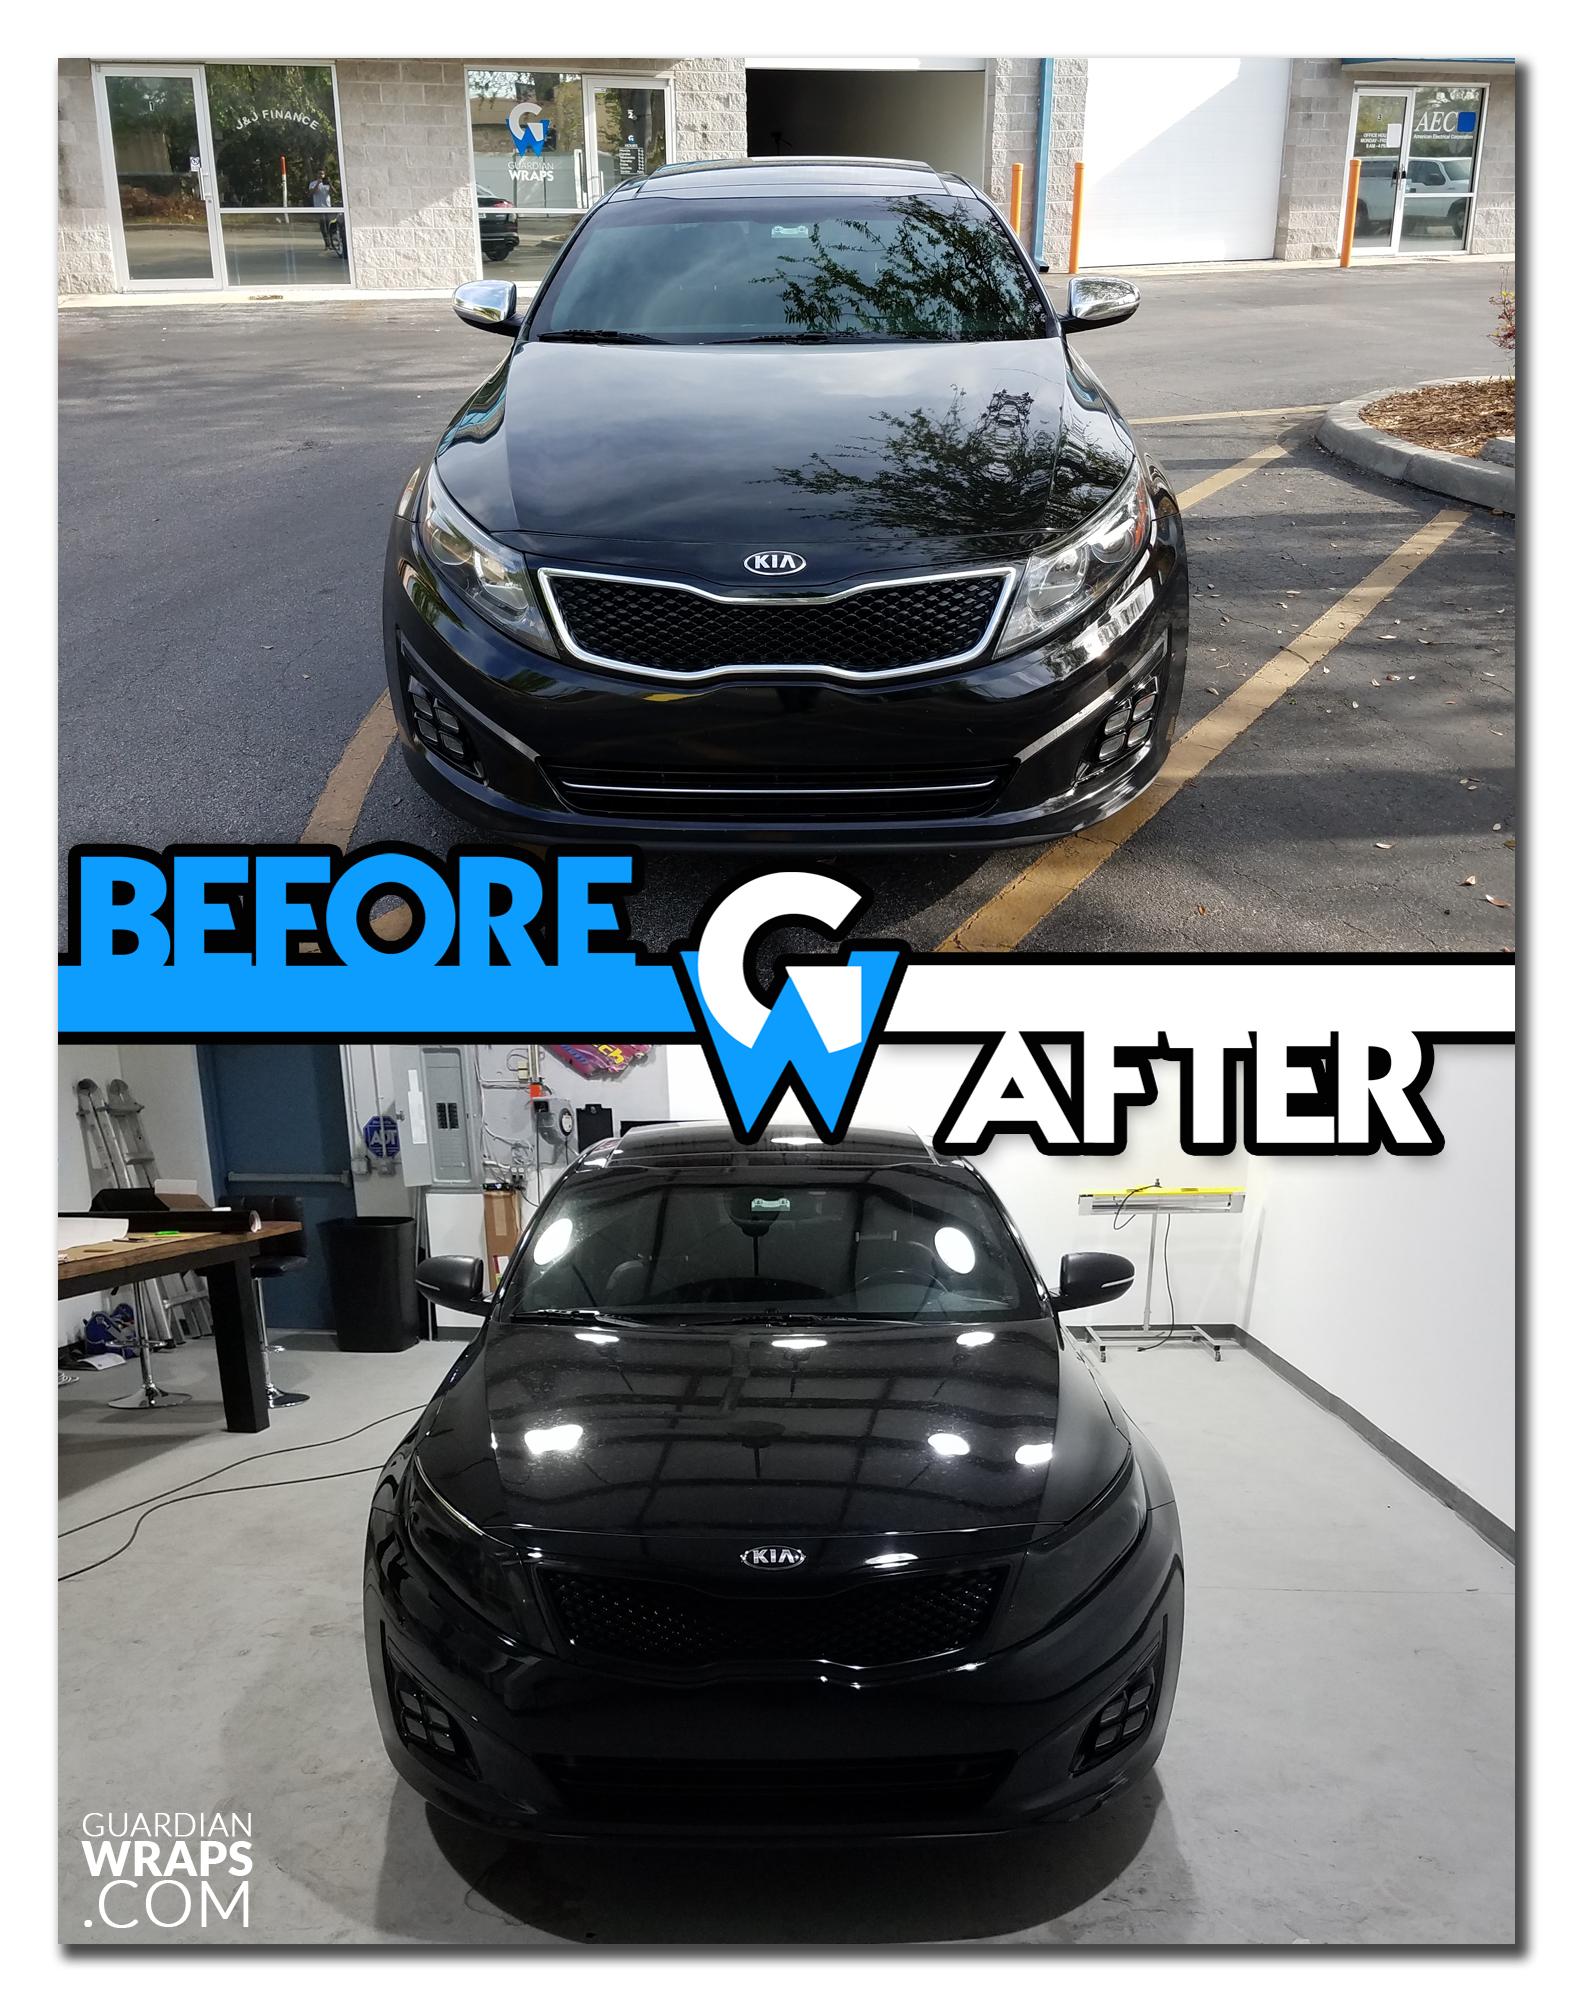 2014 Kia Optima Chrome Delete Headlight Tint Before After Rear Spoiler Vinyl Wrap Car Headlights